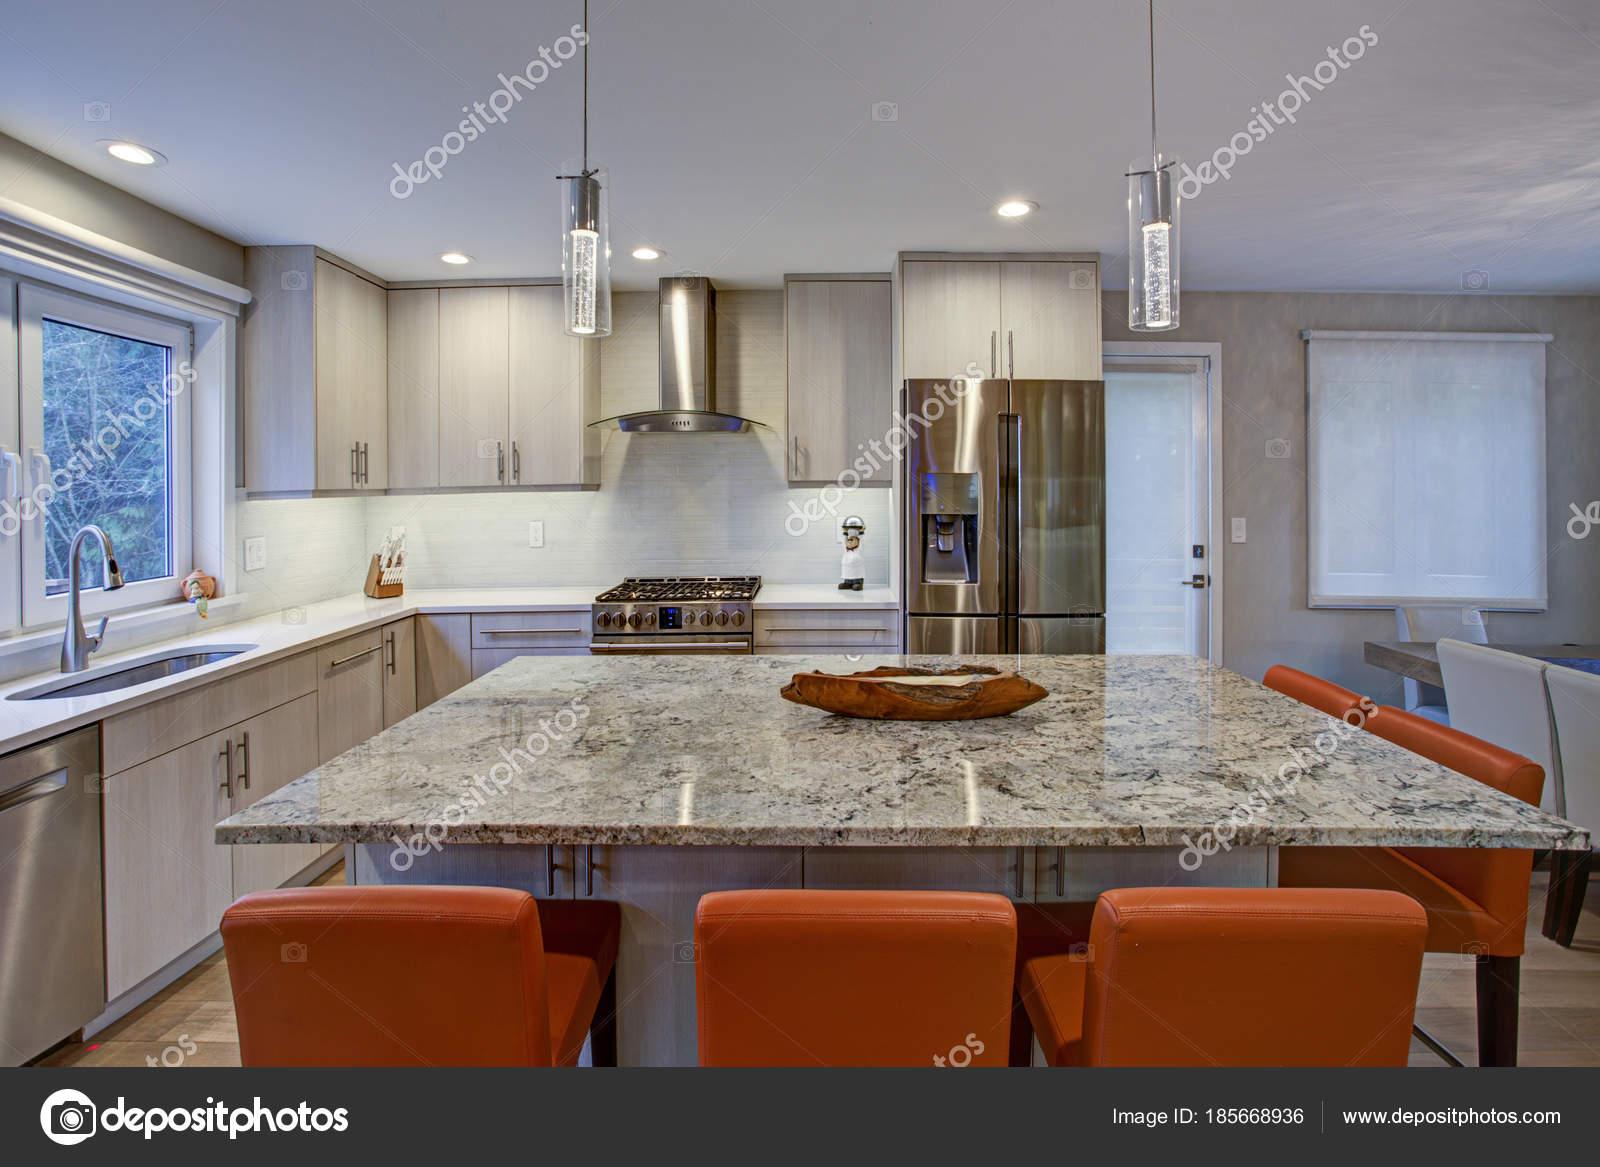 Hermosa cocina comedor con isla de cocina — Foto de stock © alabn ...